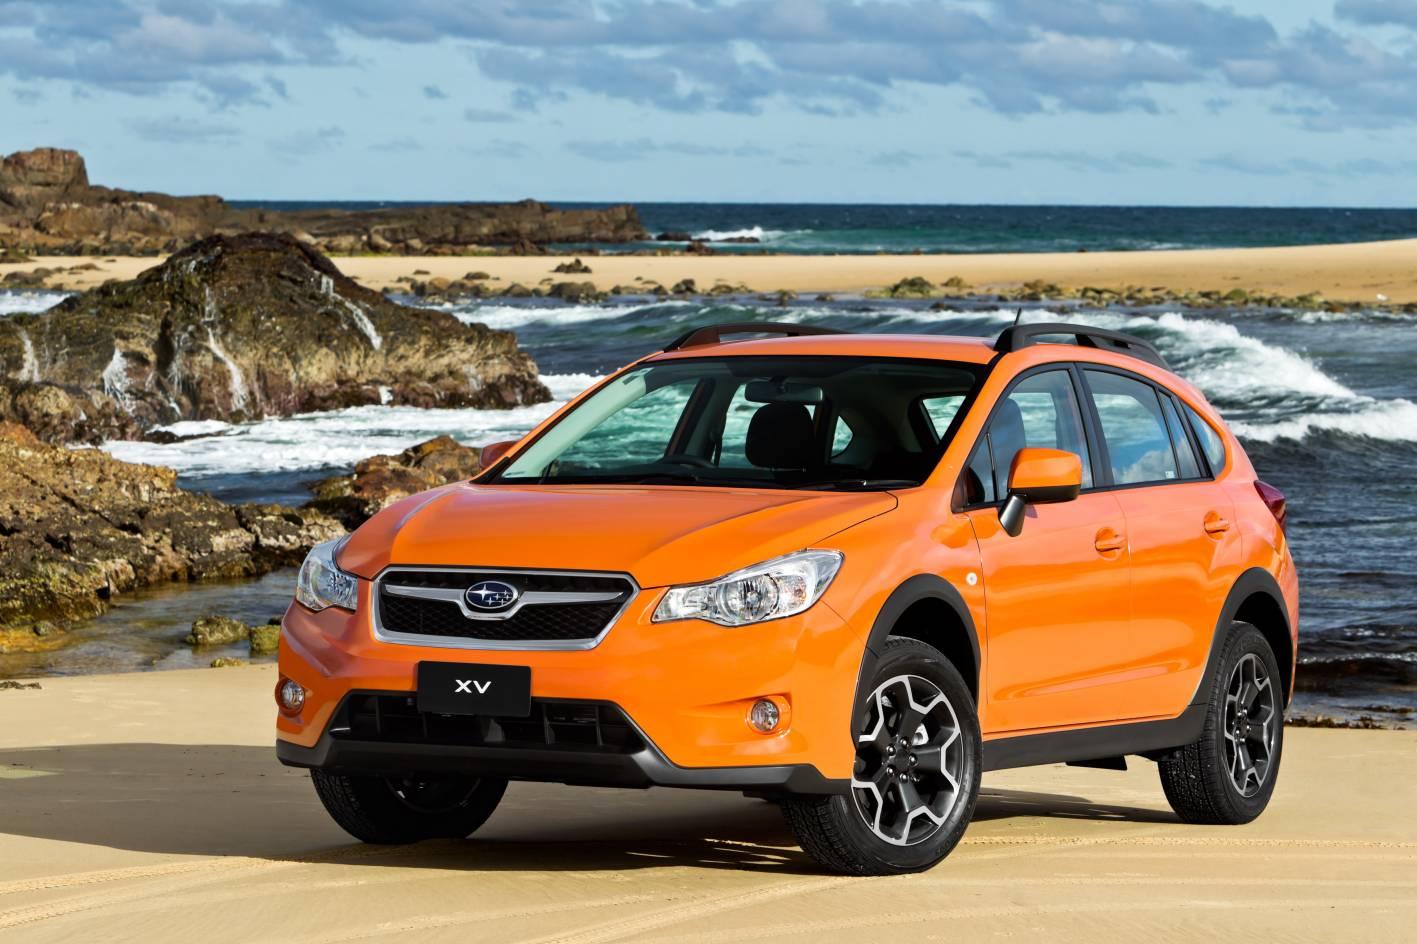 Who Owns Subaru >> Video New Price Makes Subaru Xv A True Hard Bargain Mydrive Media